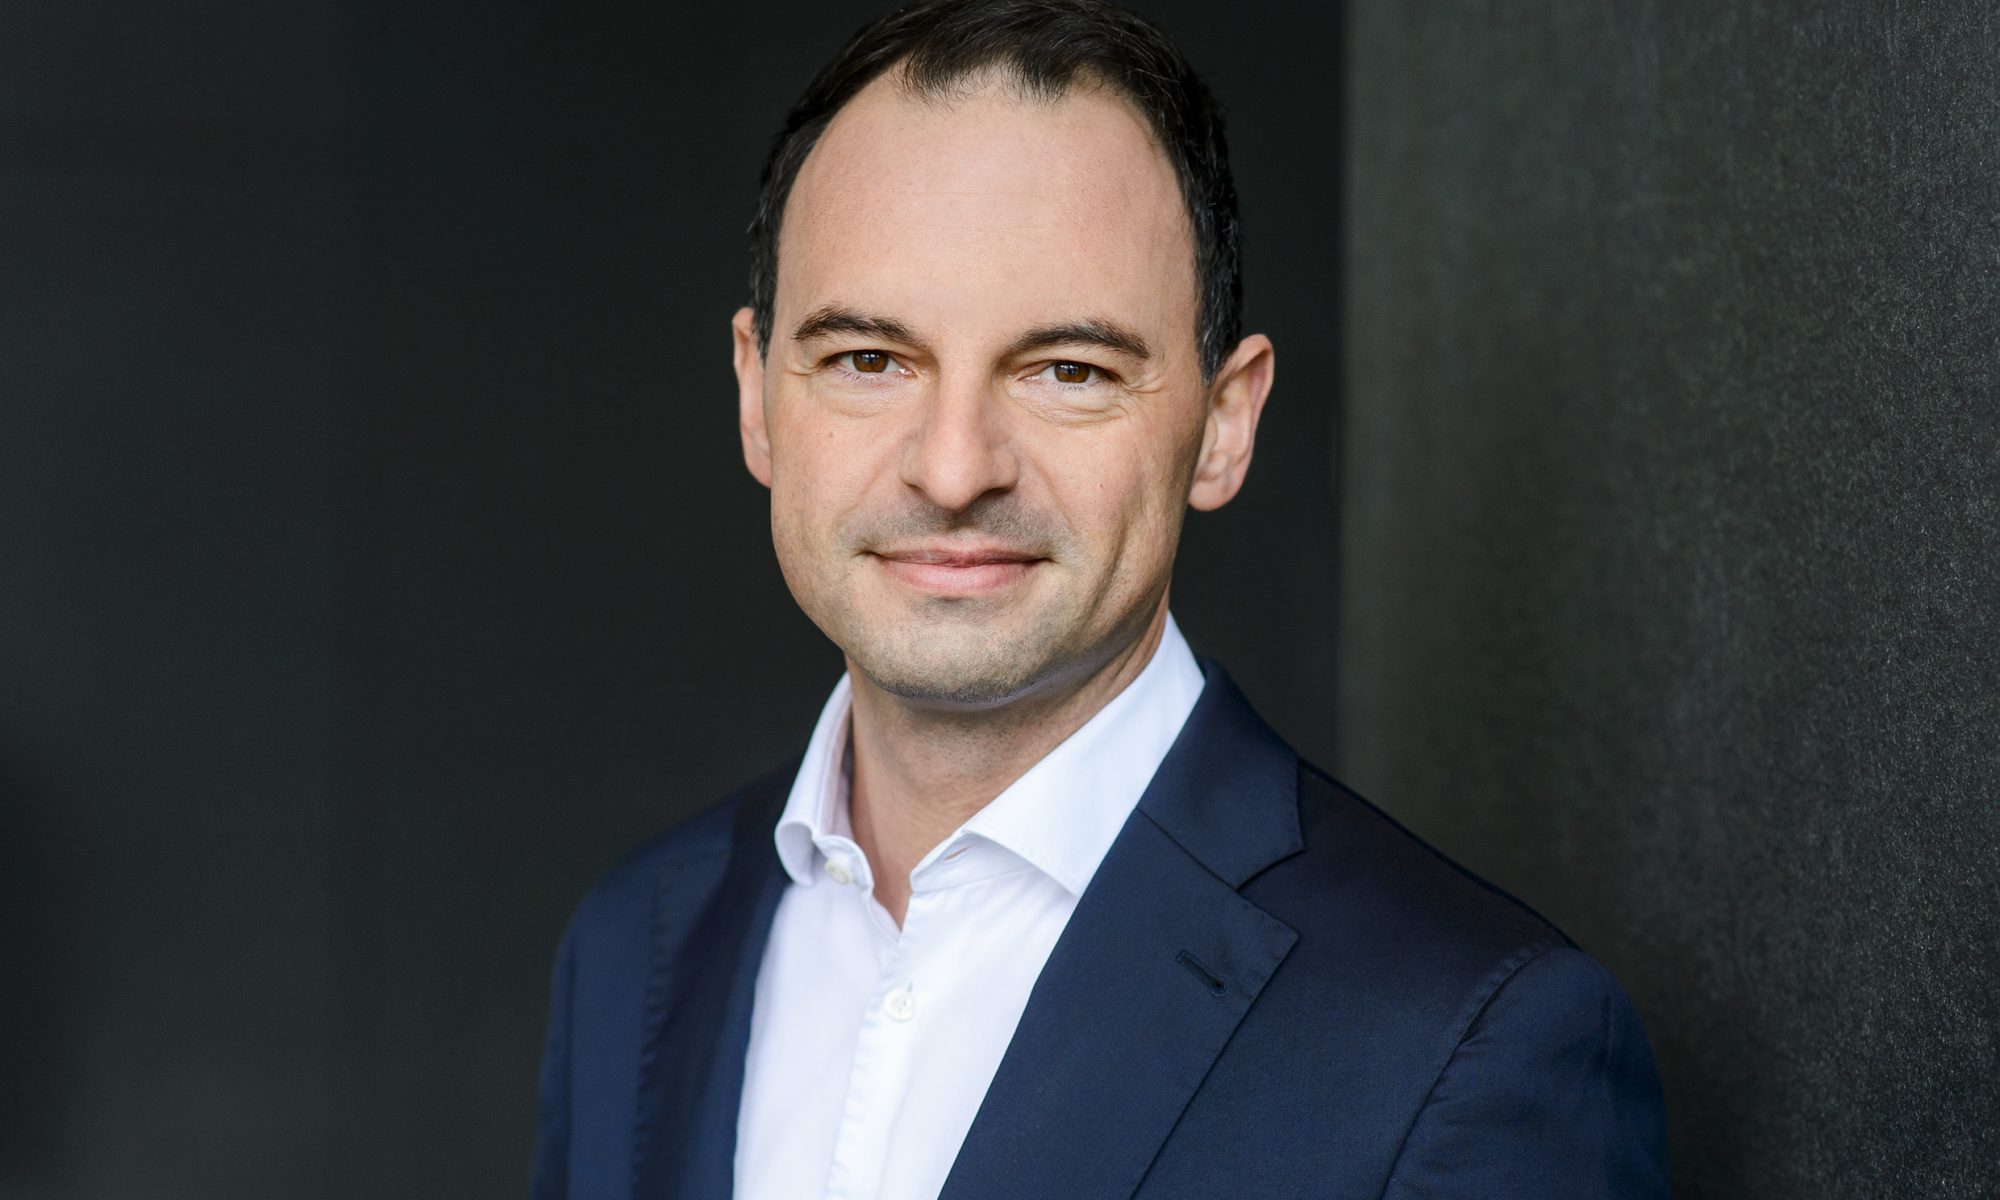 Prof. Dr. Christian Langmann